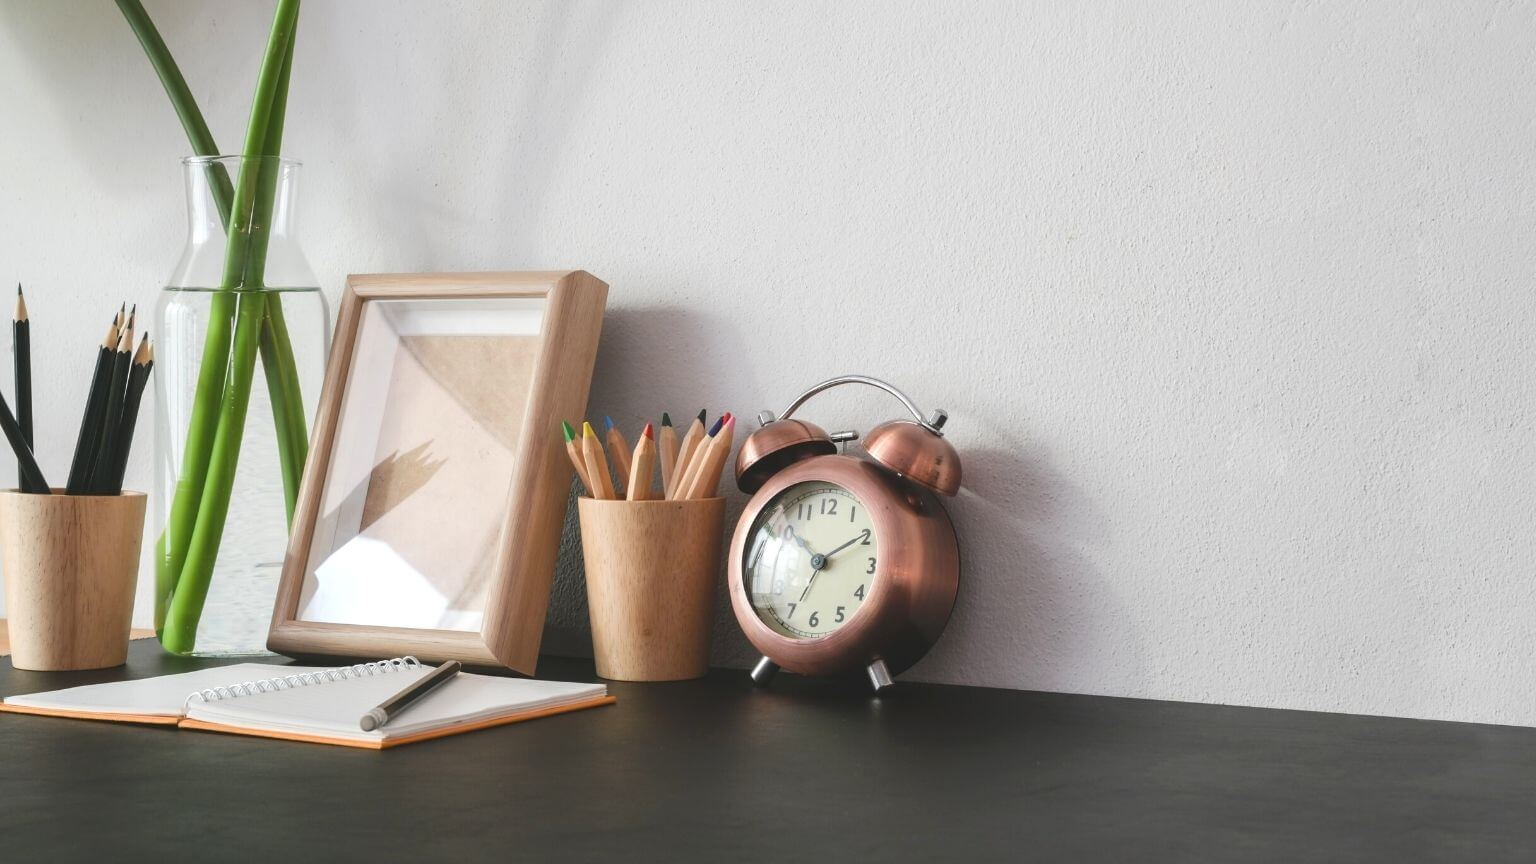 Les 6 phases de la procrastination - Cover Post